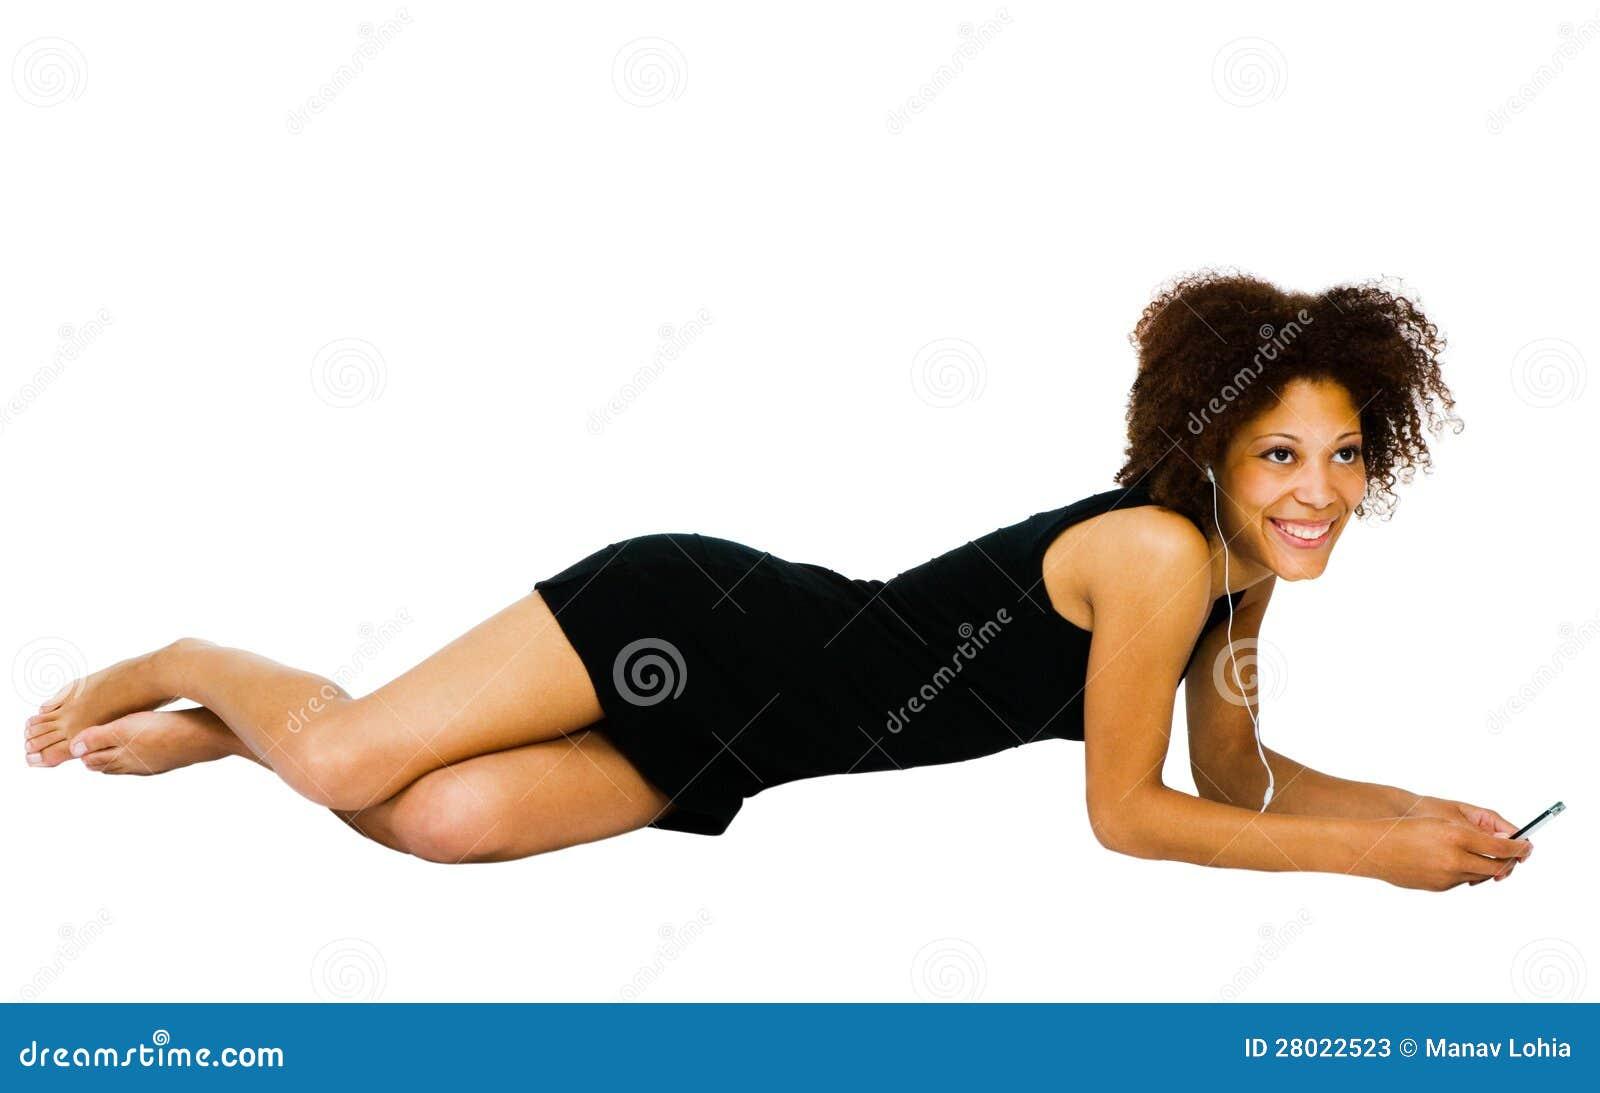 Czolba recommend Lady sonya interracial porn